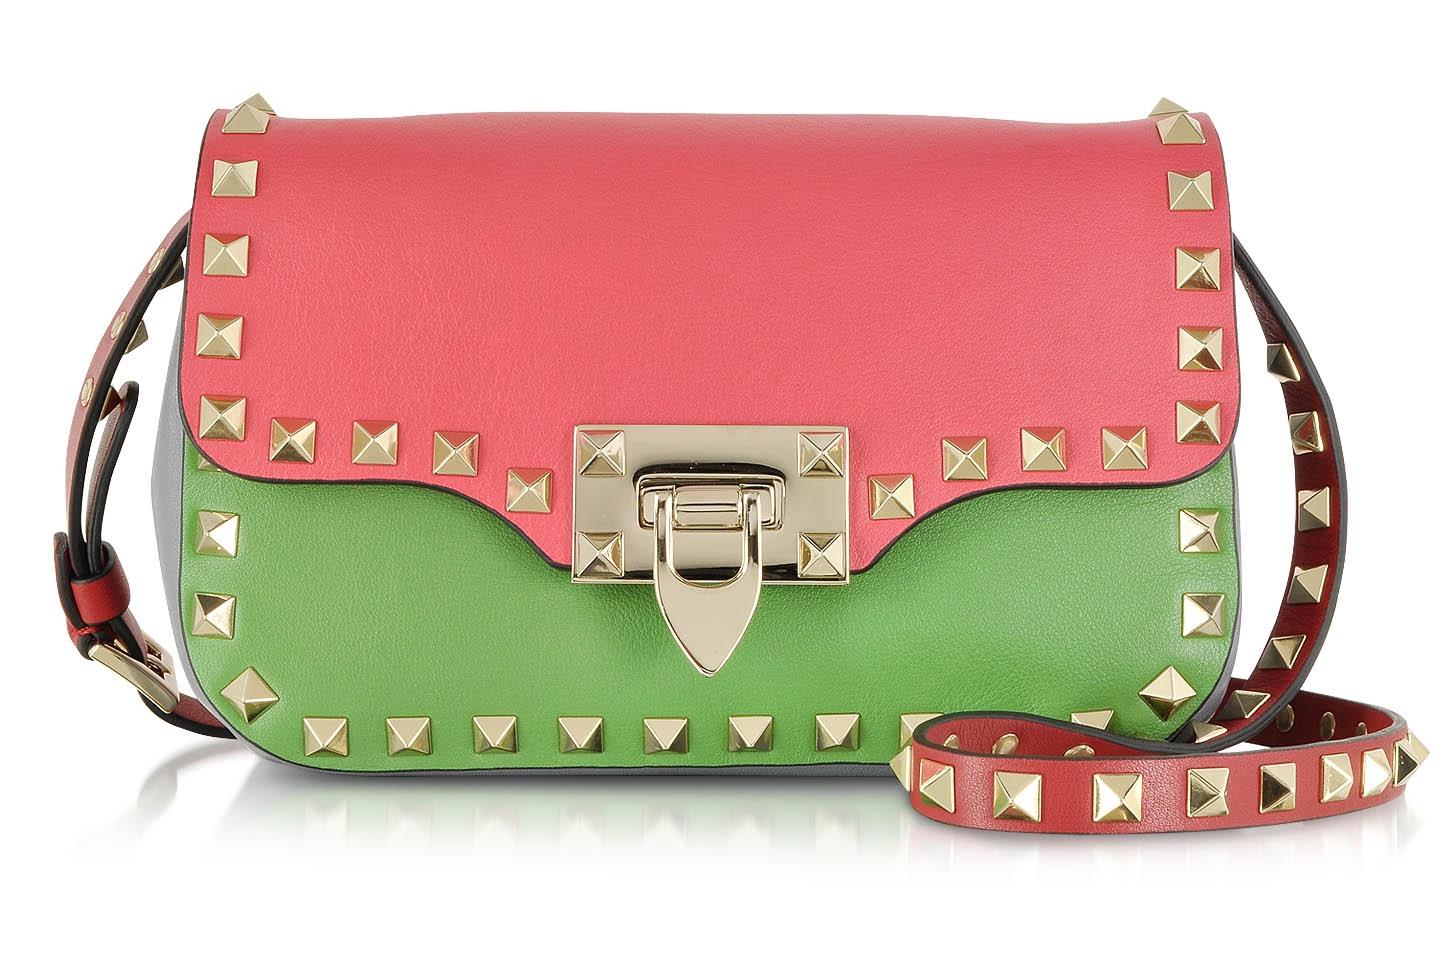 Valentino Rockstud Multicolor Leather Crossbody Bag